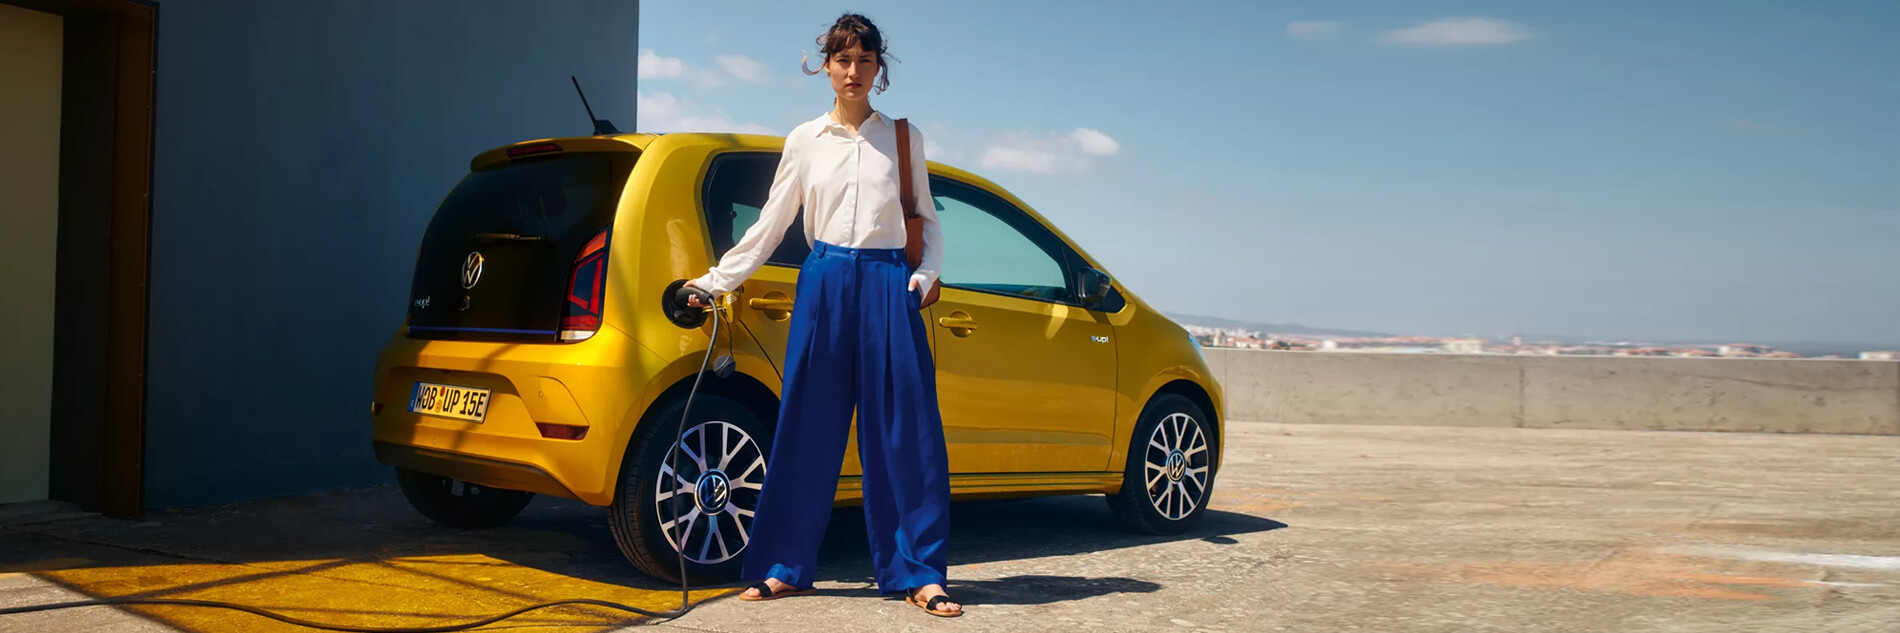 Volkswagen-e-up-header-1900x633